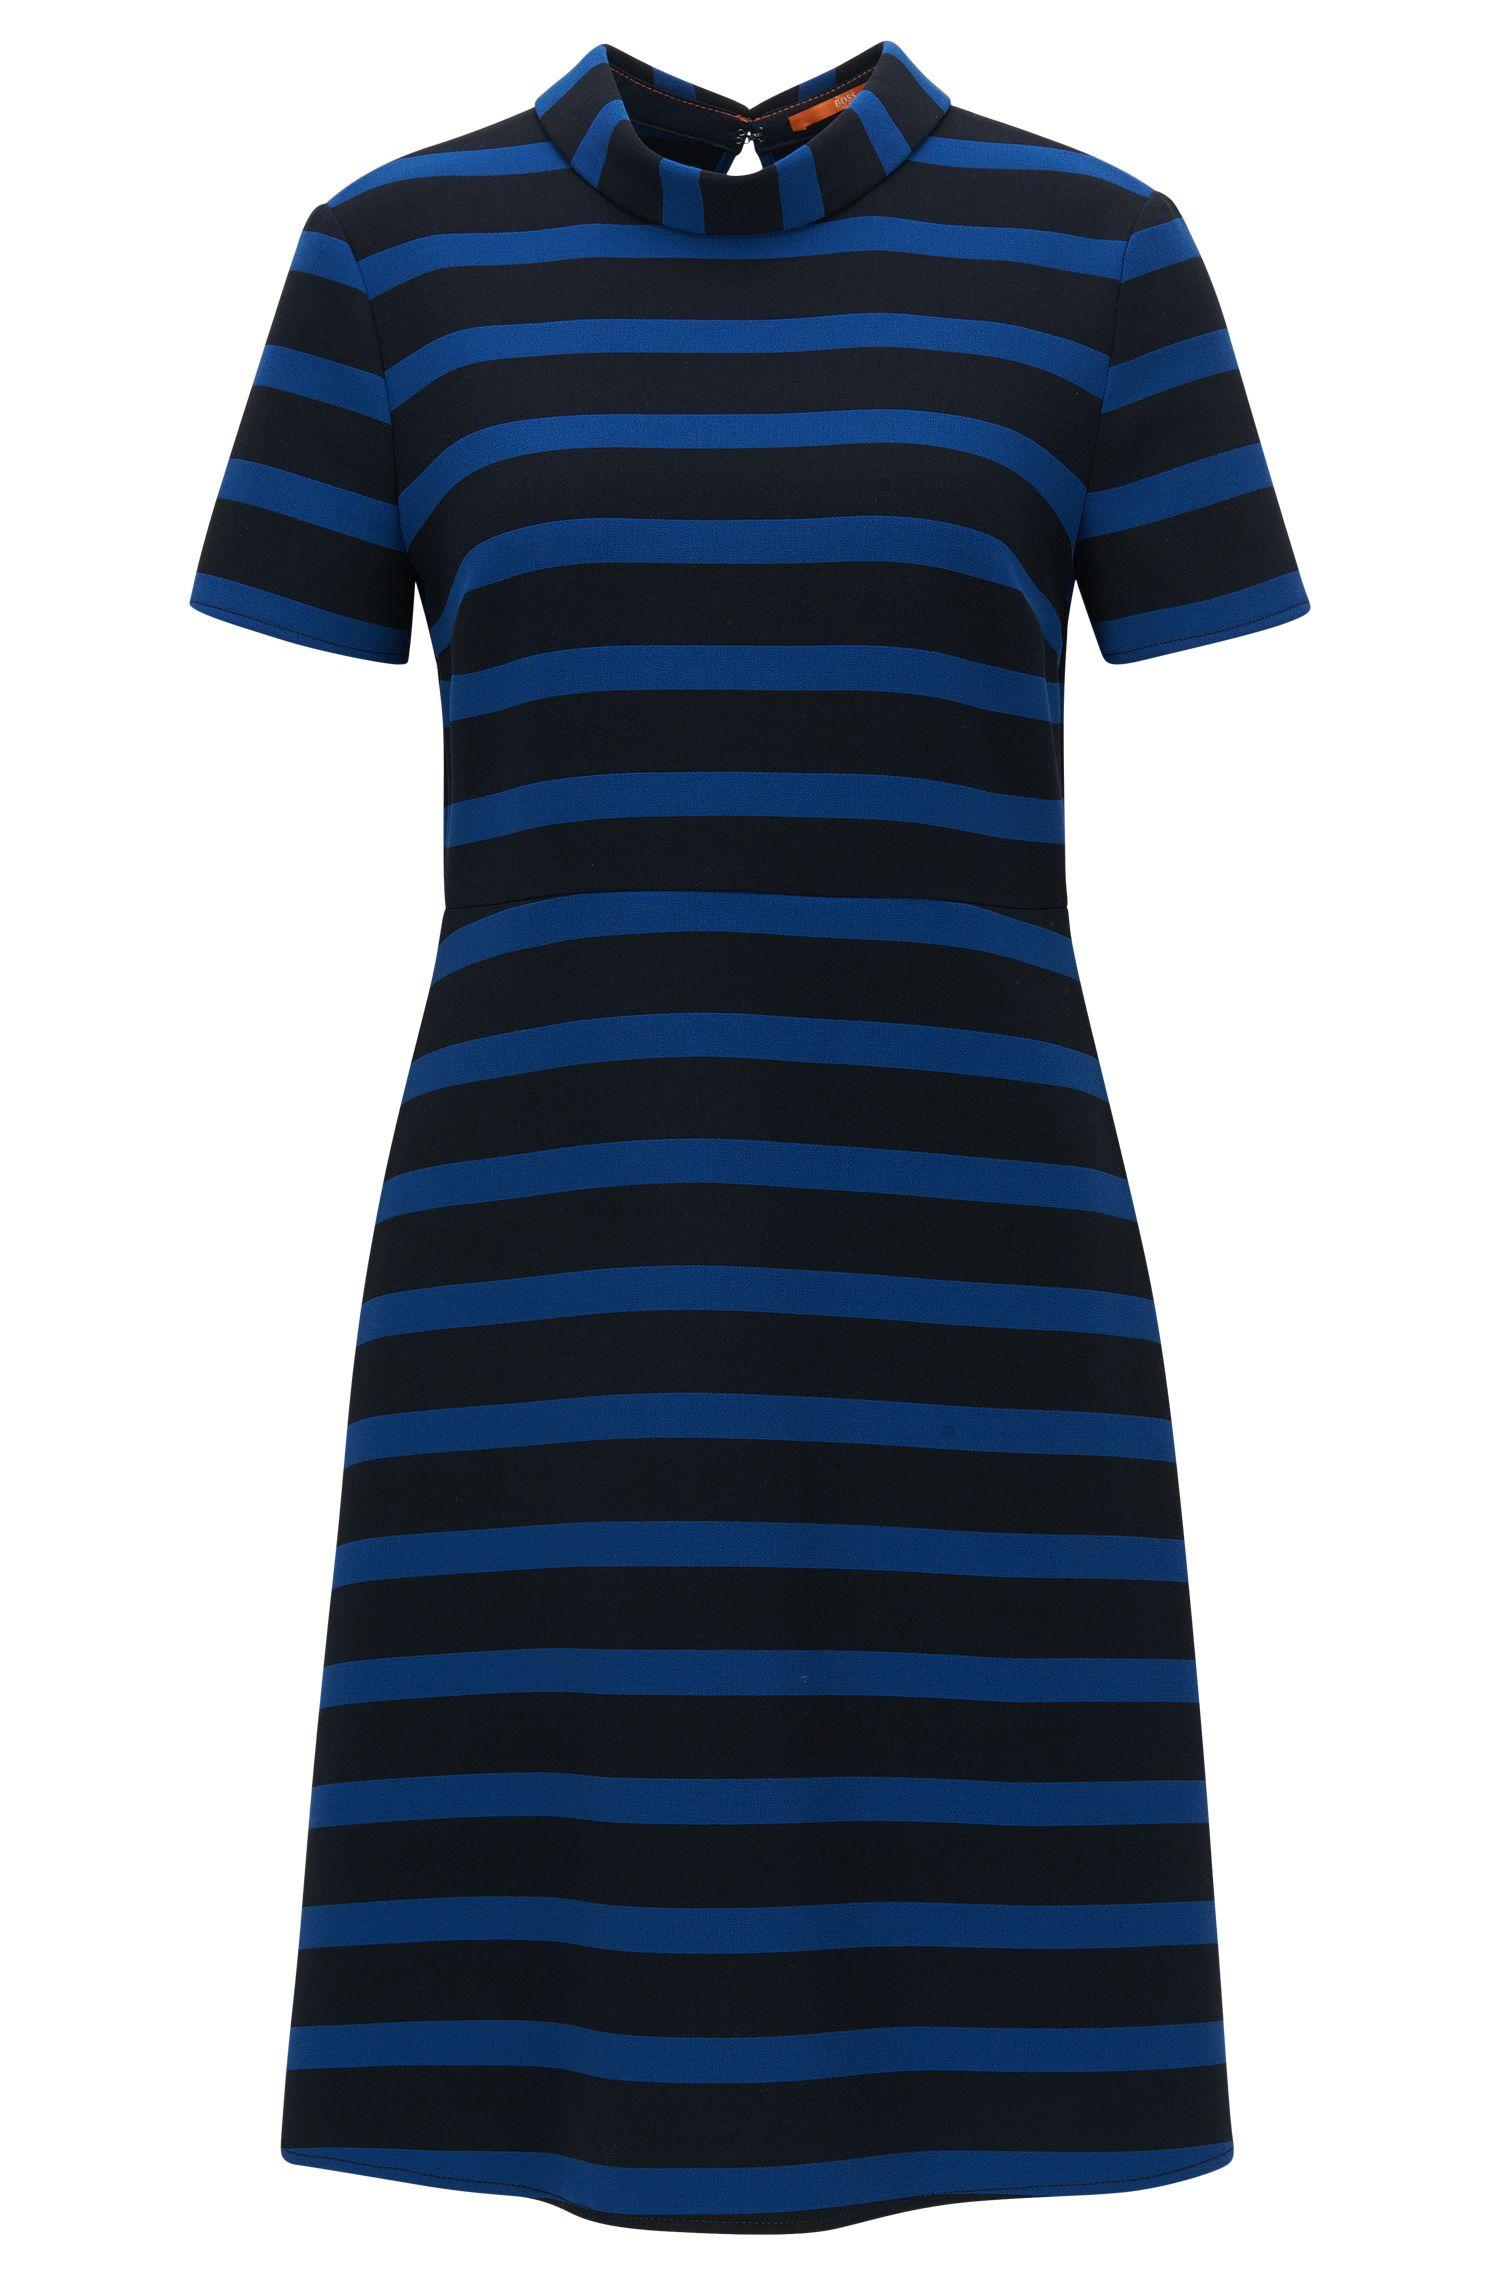 Regular-fit jurk in A-lijn, van stretchmateriaal